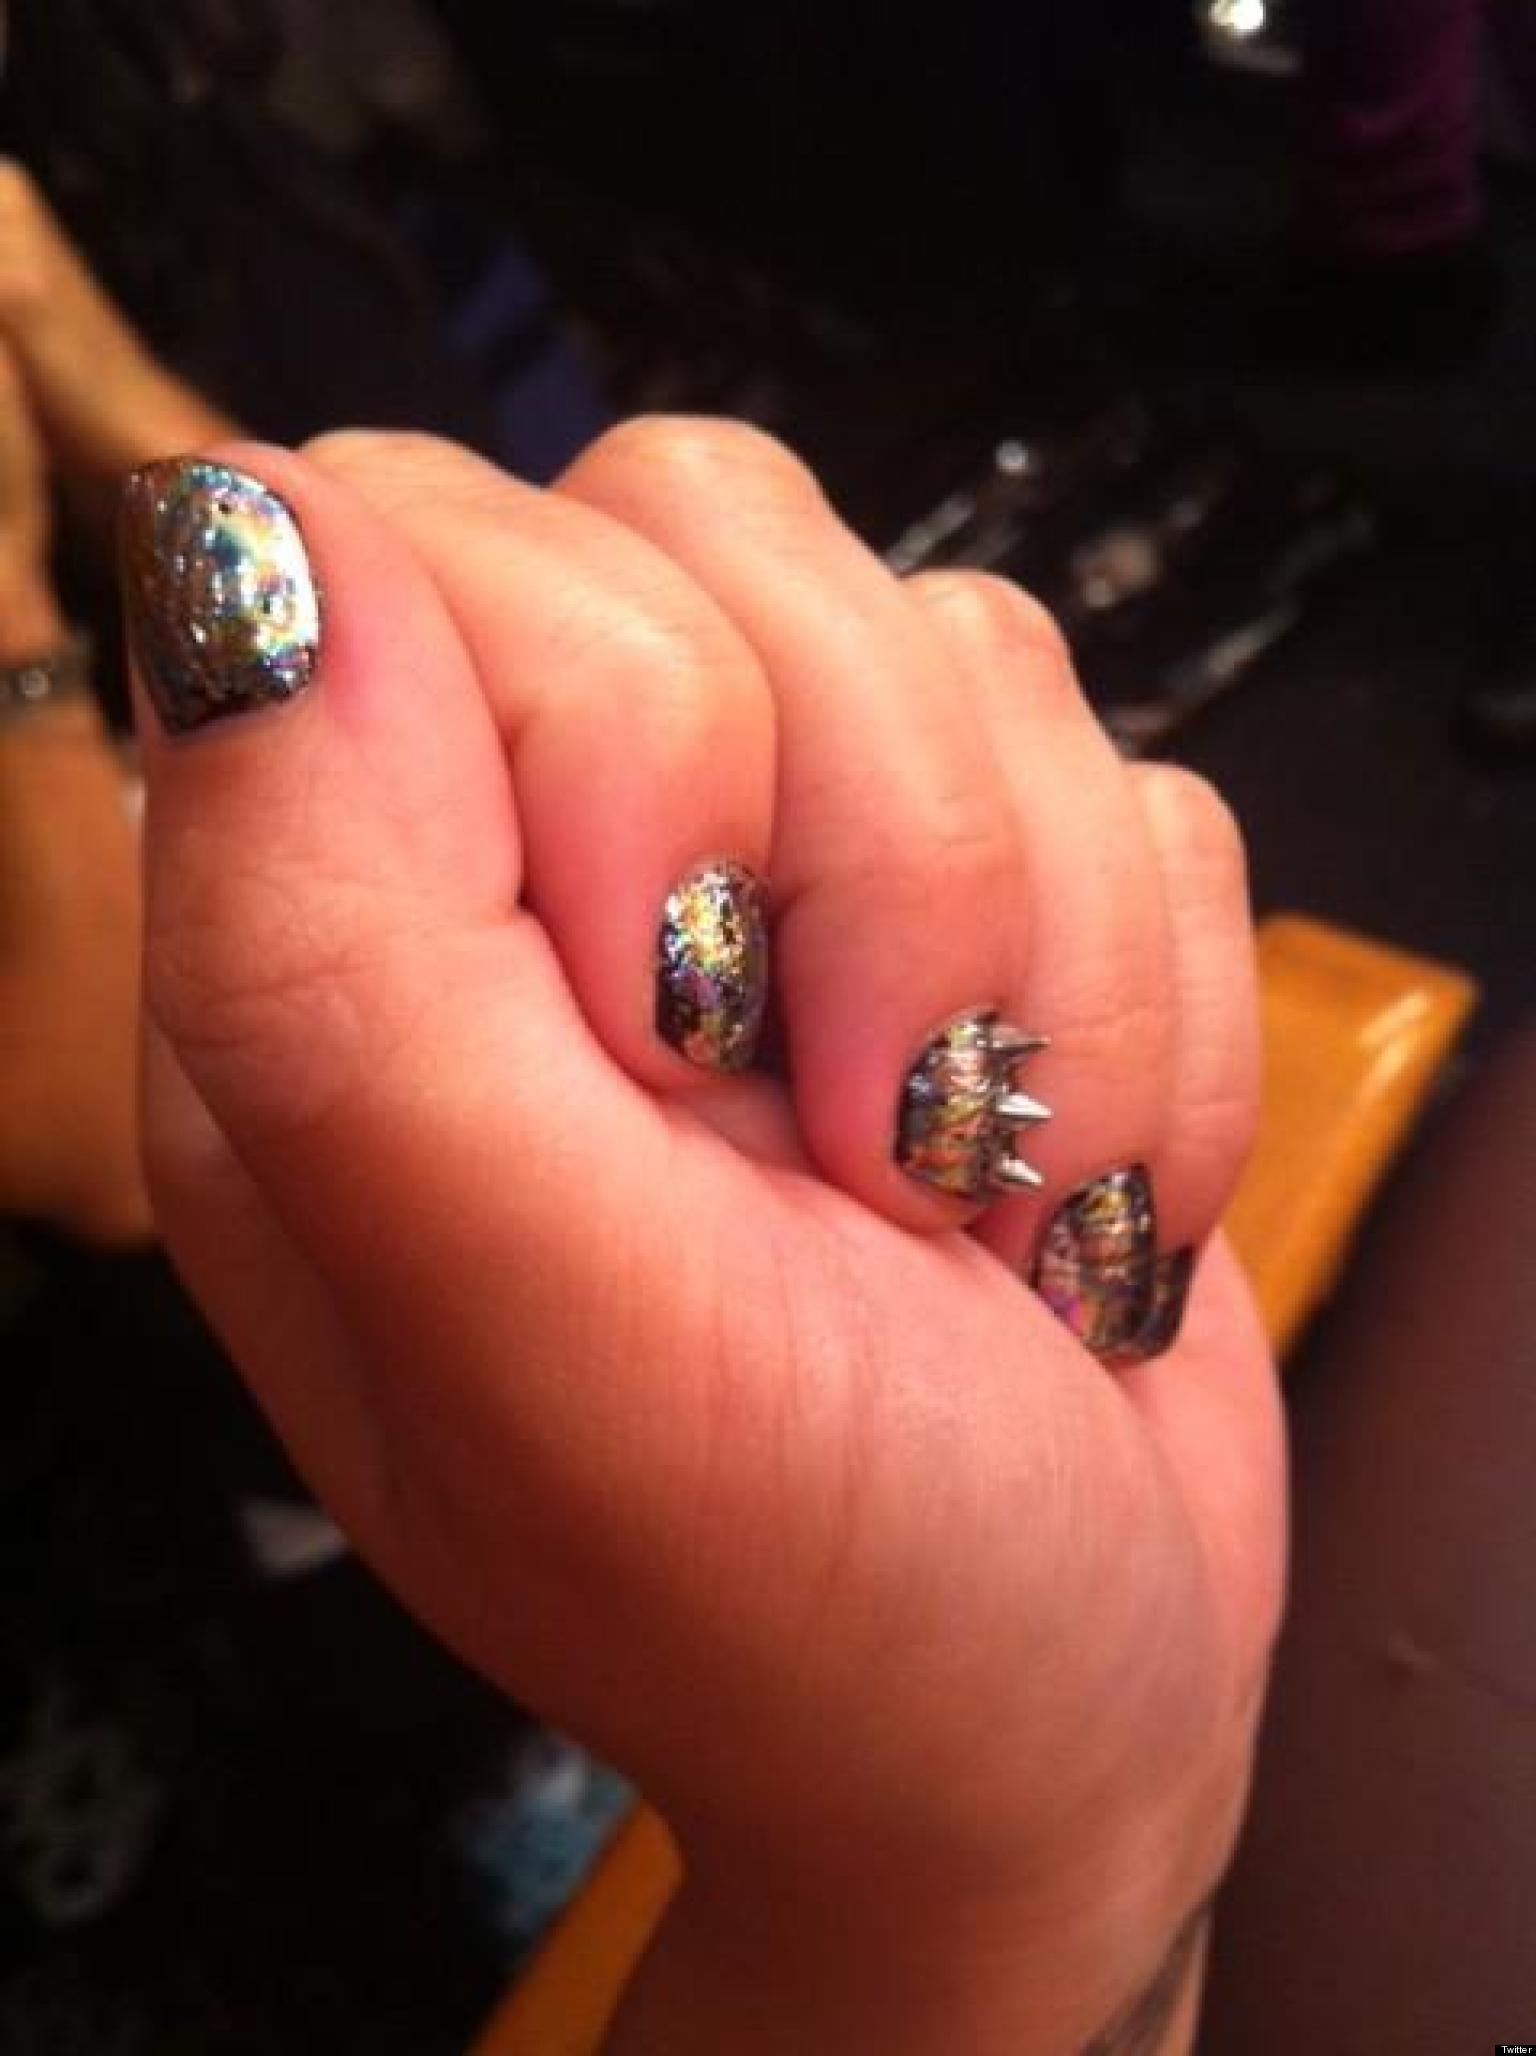 Demi Lovato Style Star Shows Off Metallic Nail Art On Twitter Photos Huffpost